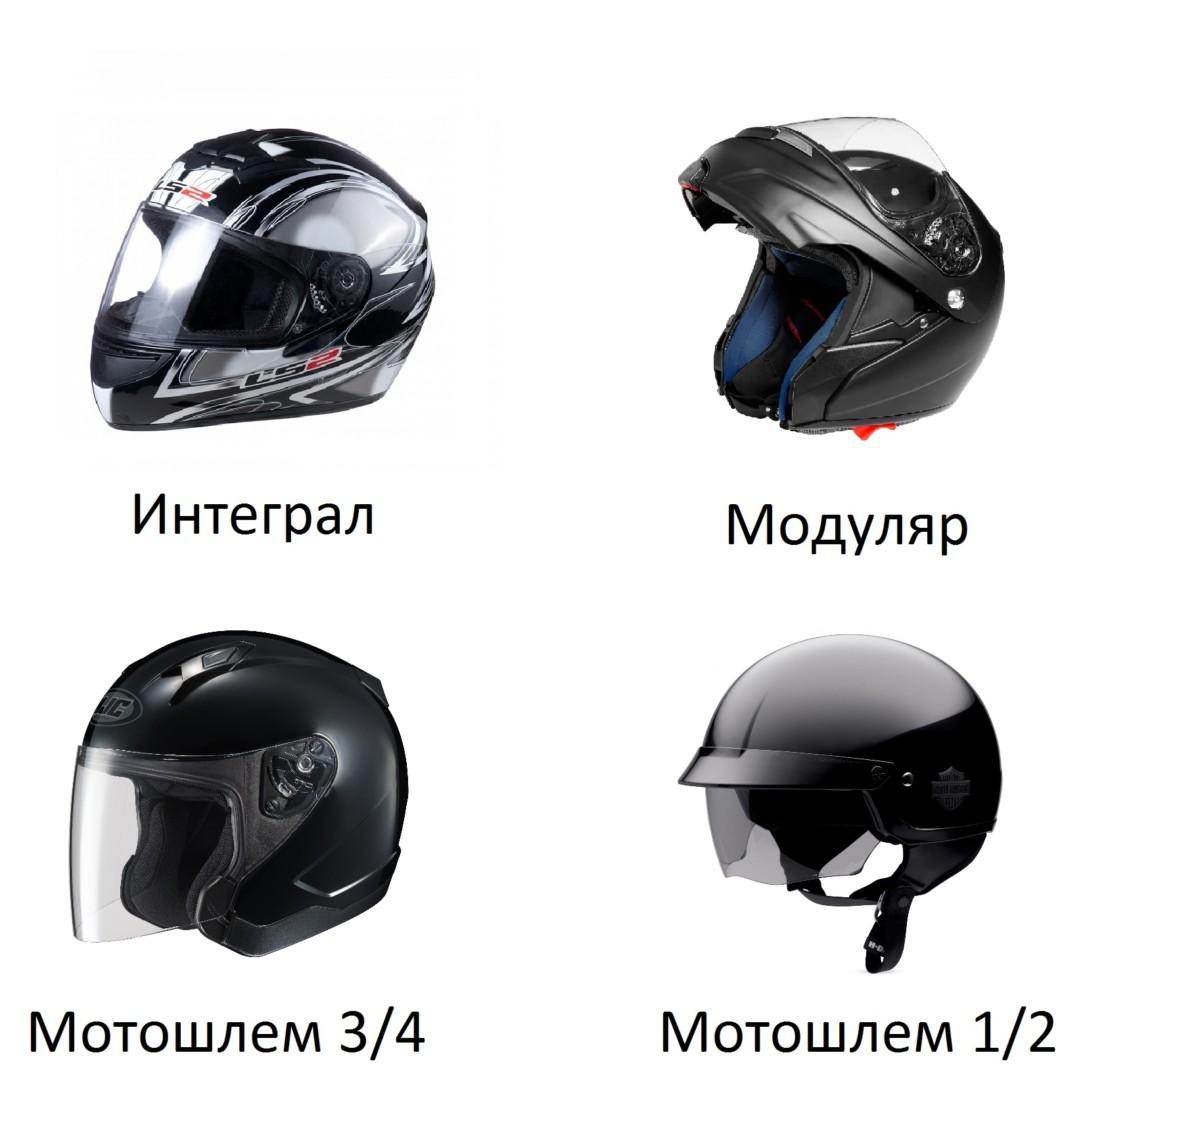 мотошлем модуляр, интеграл, открытый шлем